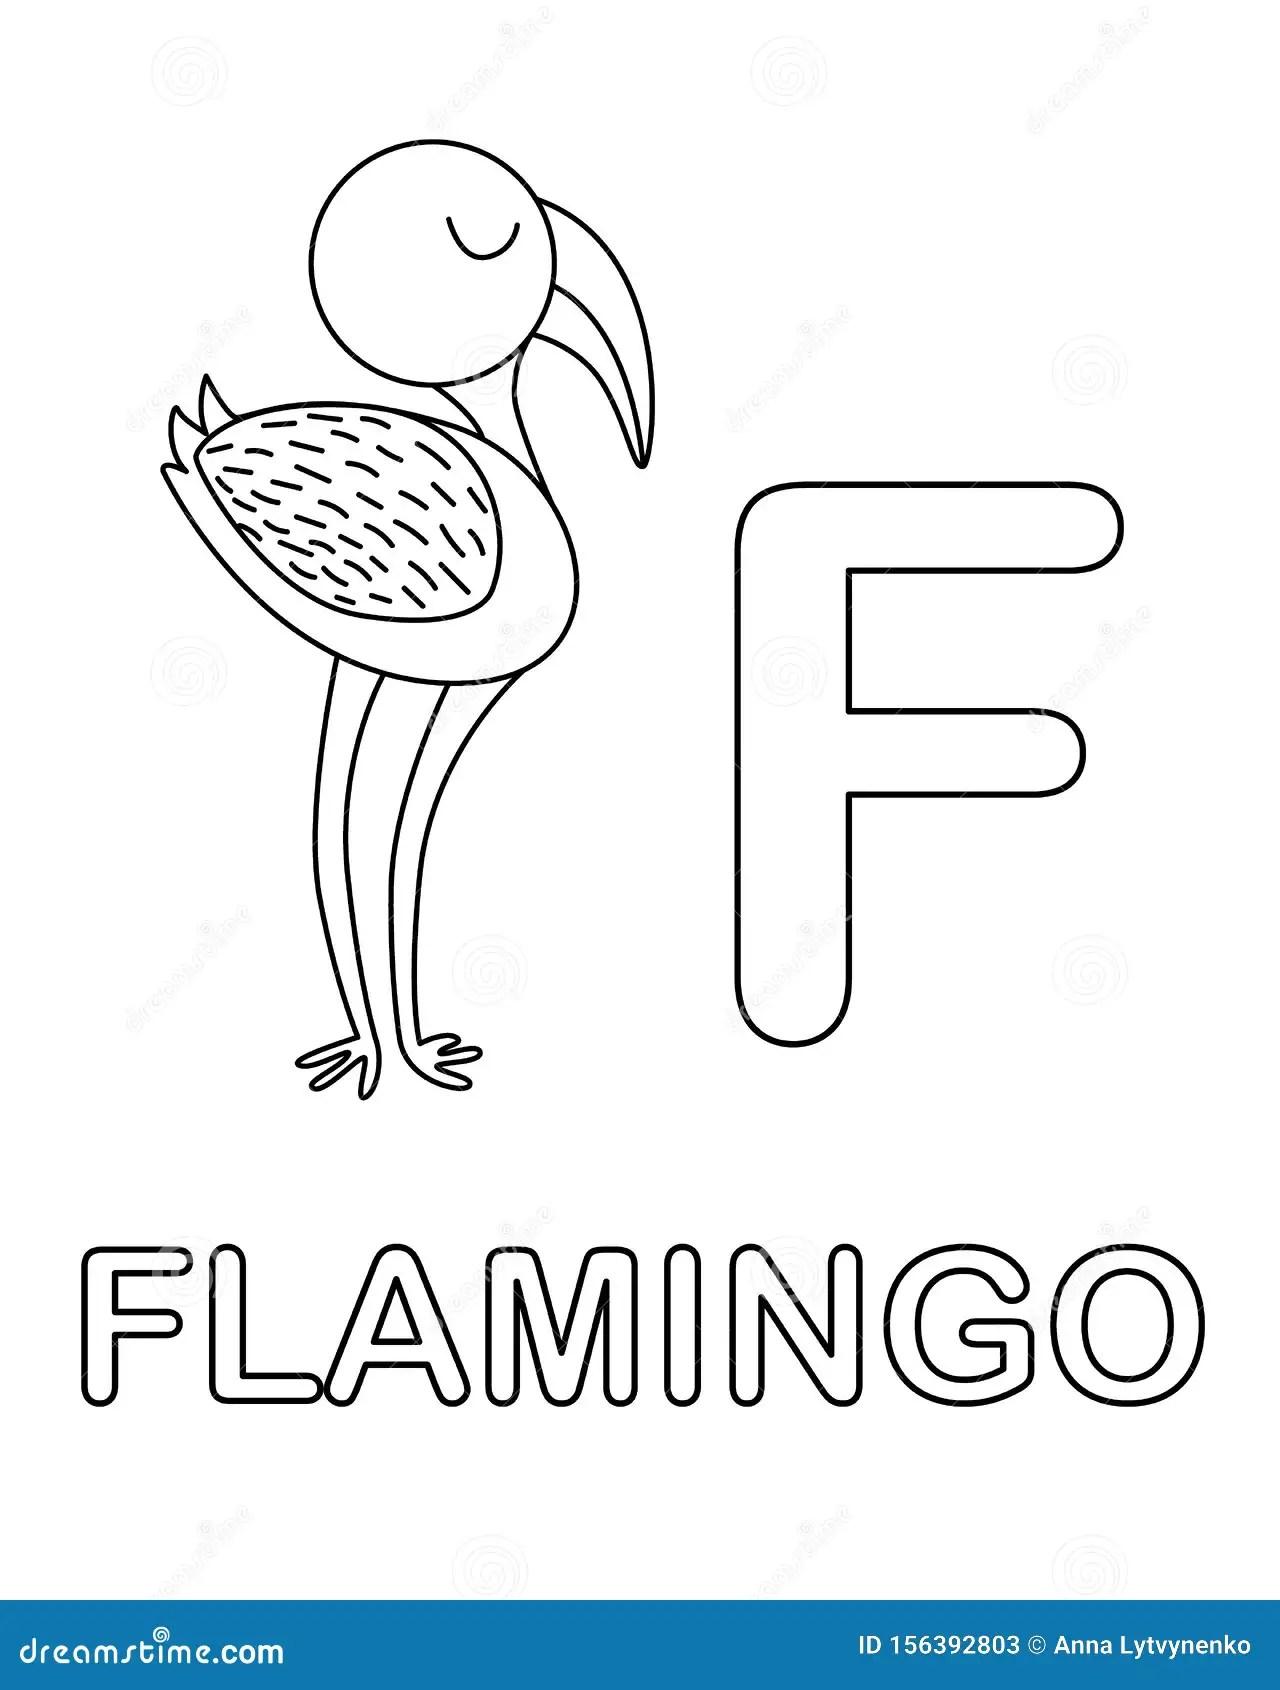 Flamingo Bird Icon With English Alphabet Letter F In